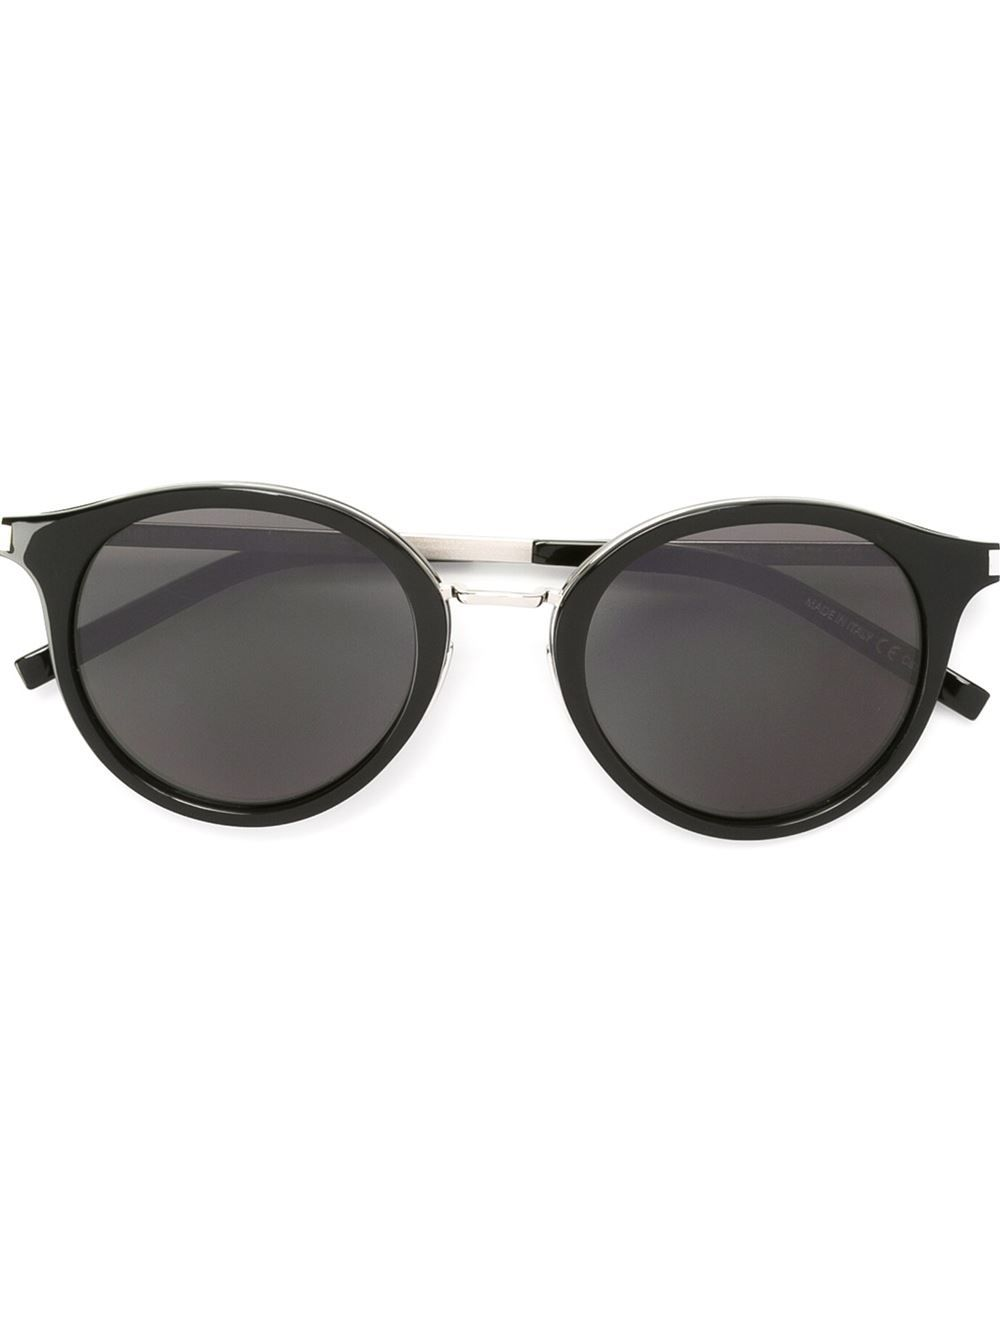 Saint Laurent Eyewear Gafas De Sol Con Montura Redonda | Saint ...